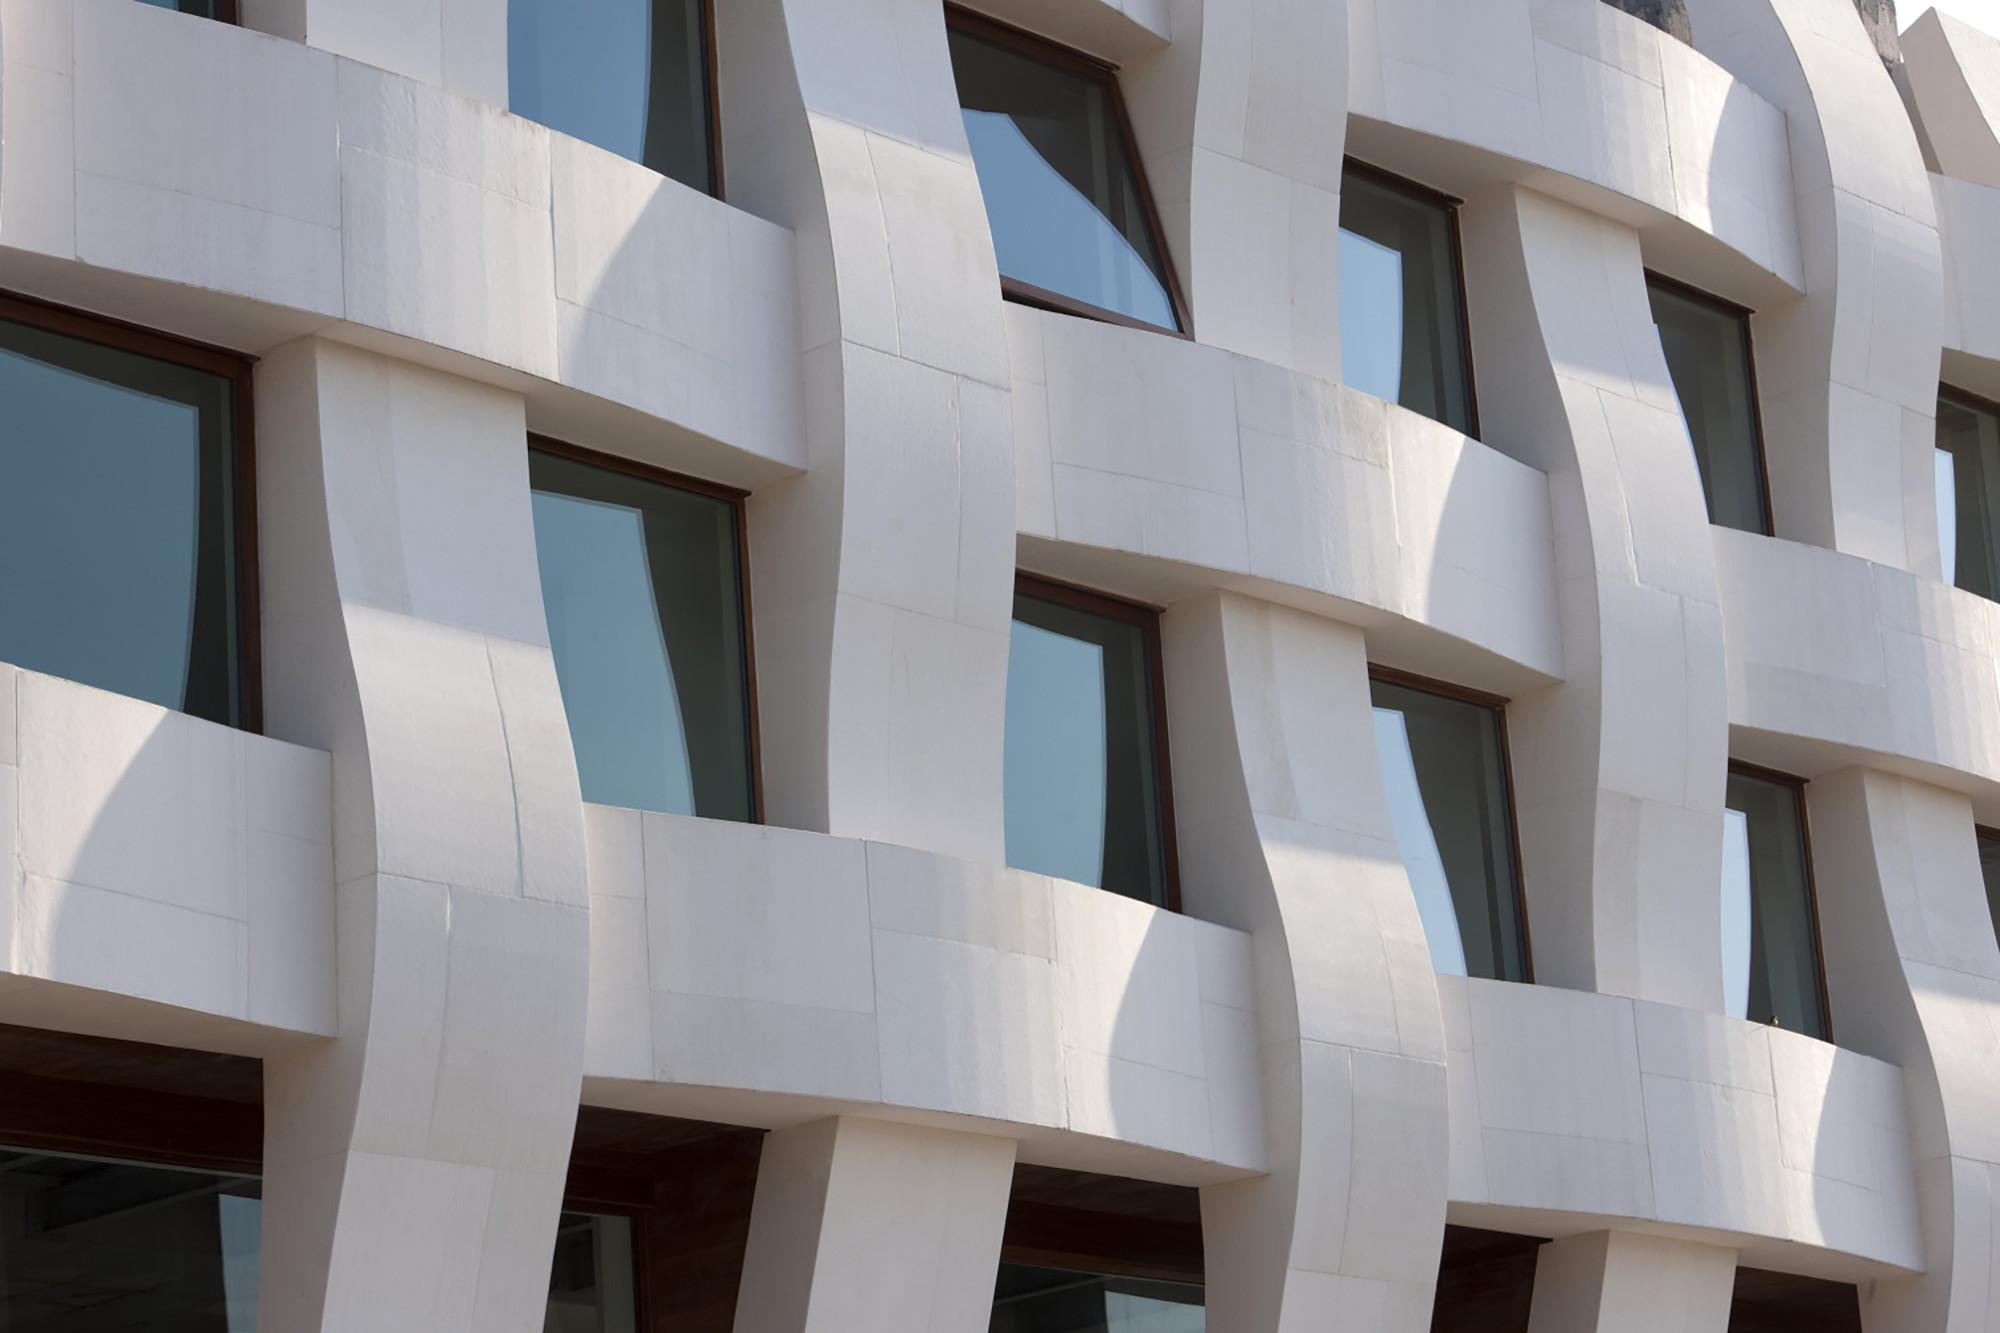 Gallery of argul weave binaa smart architecture 4 for Architecture com